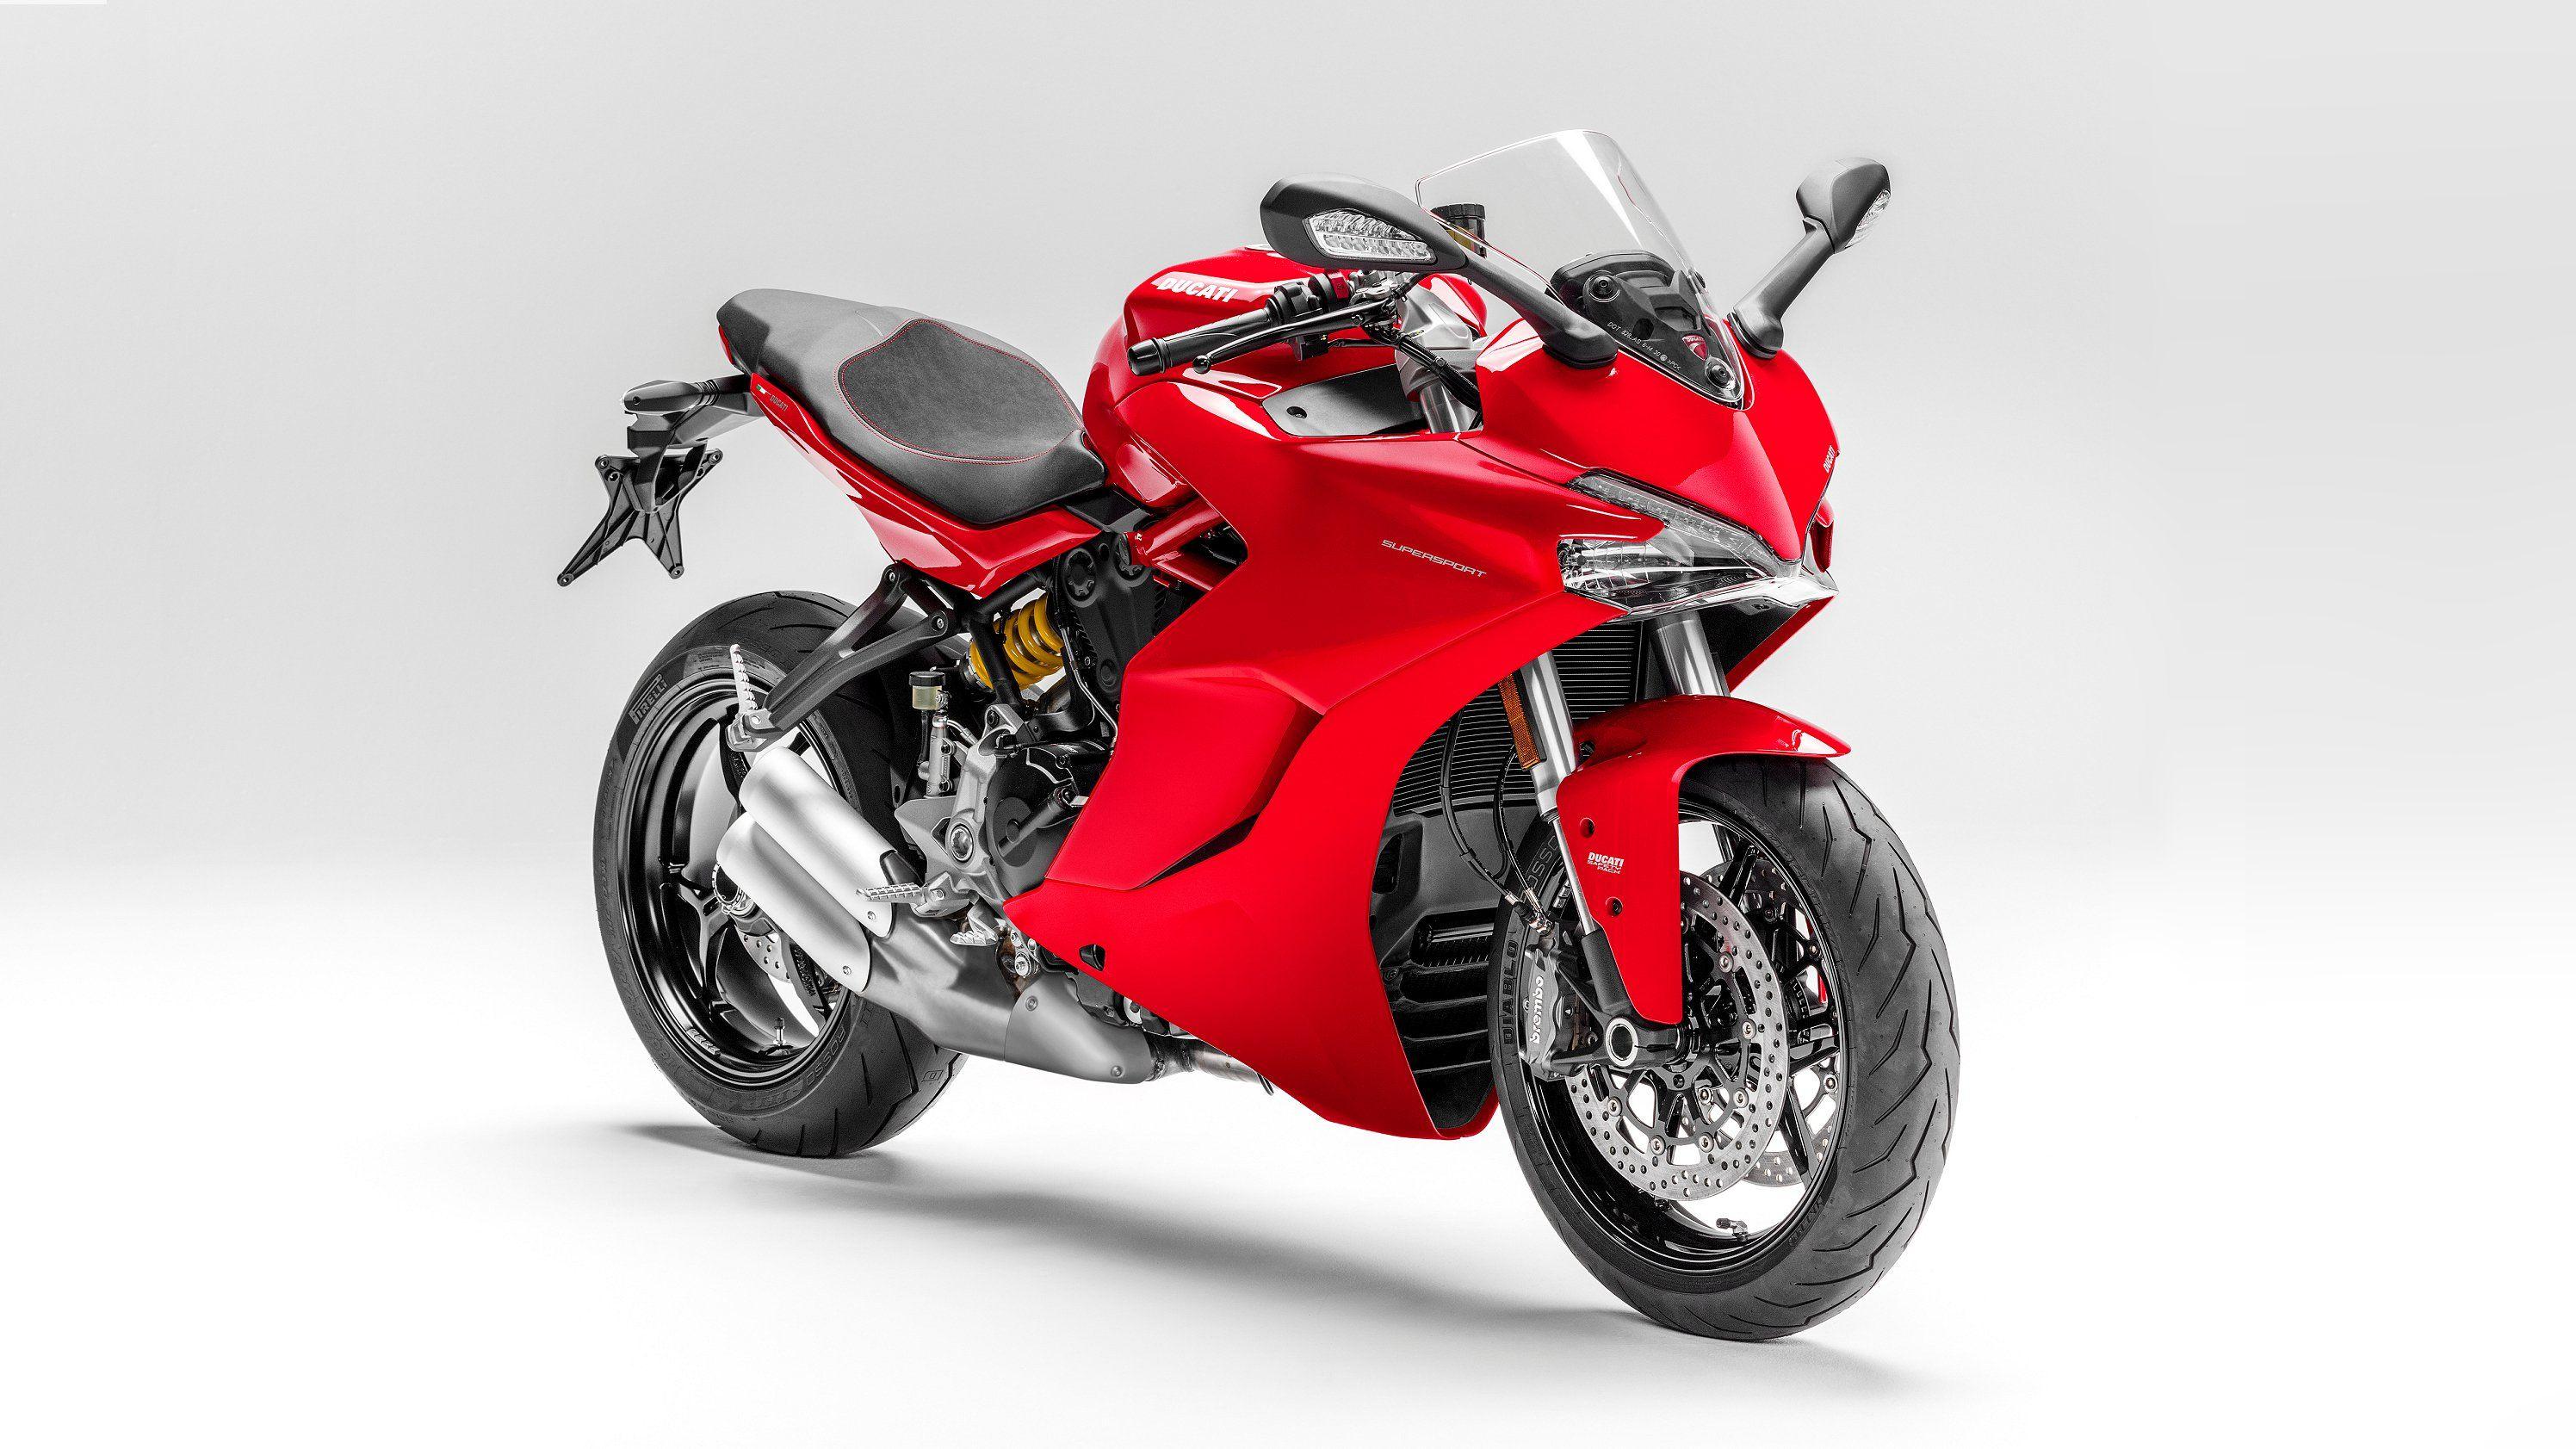 Ducati Supersport 2018 Sports Bike Price In Pakistan Ducati Supersport Supersport Ducati Motorcycles